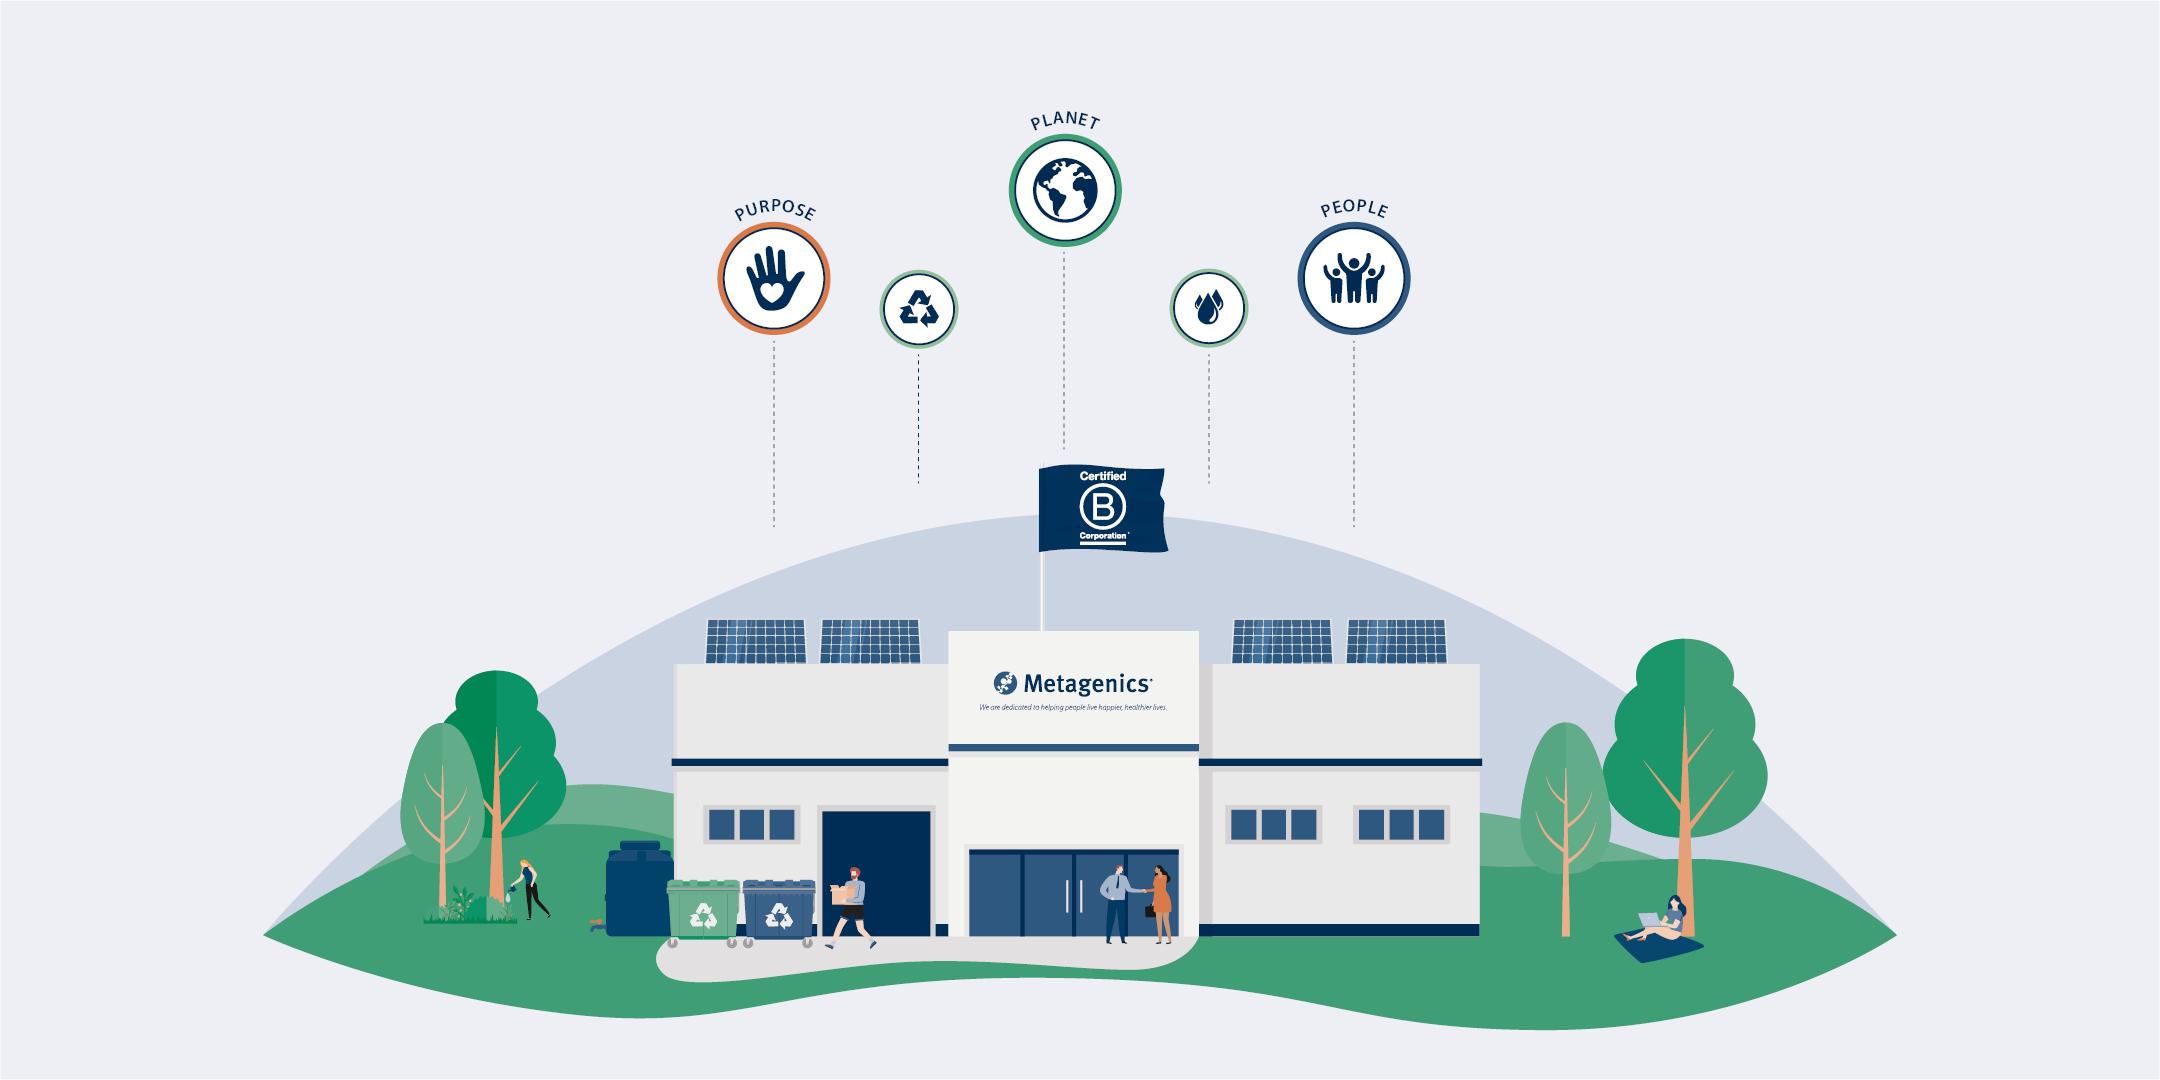 Metagenics B Corp Infographic